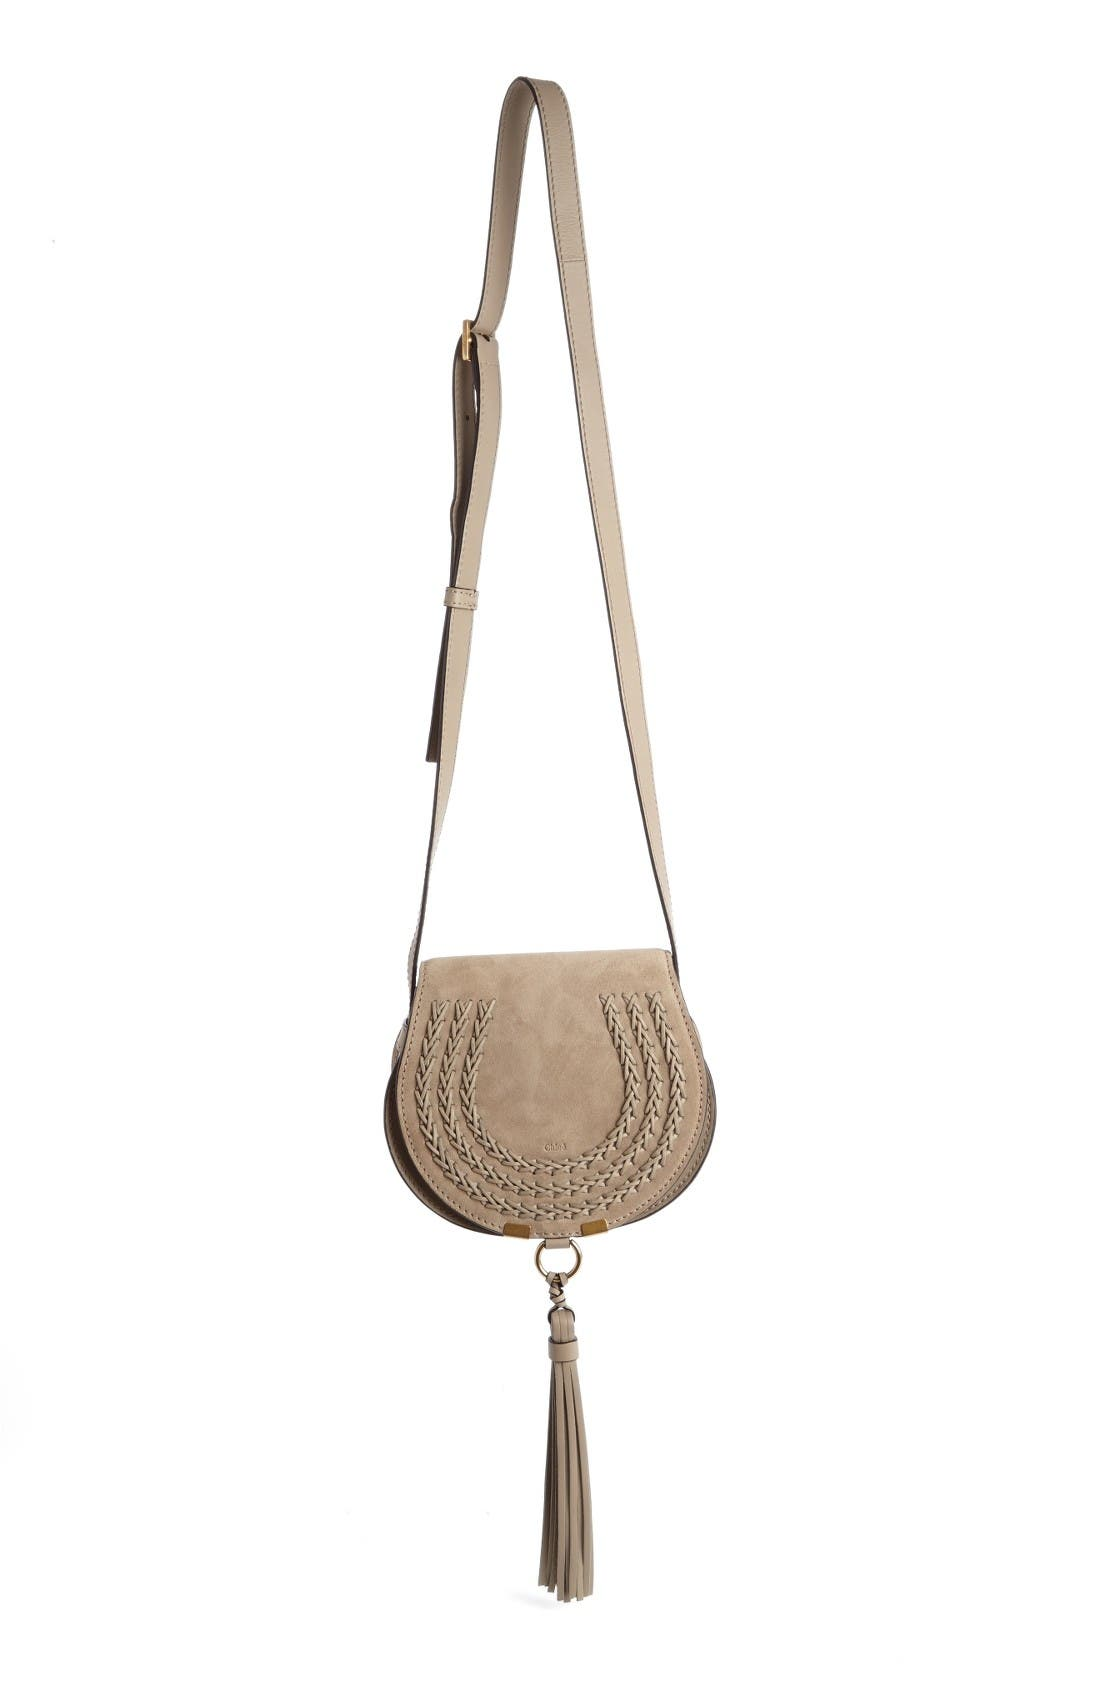 Main Image - Chloé 'Mini Marcie' Suede Saddle Bag